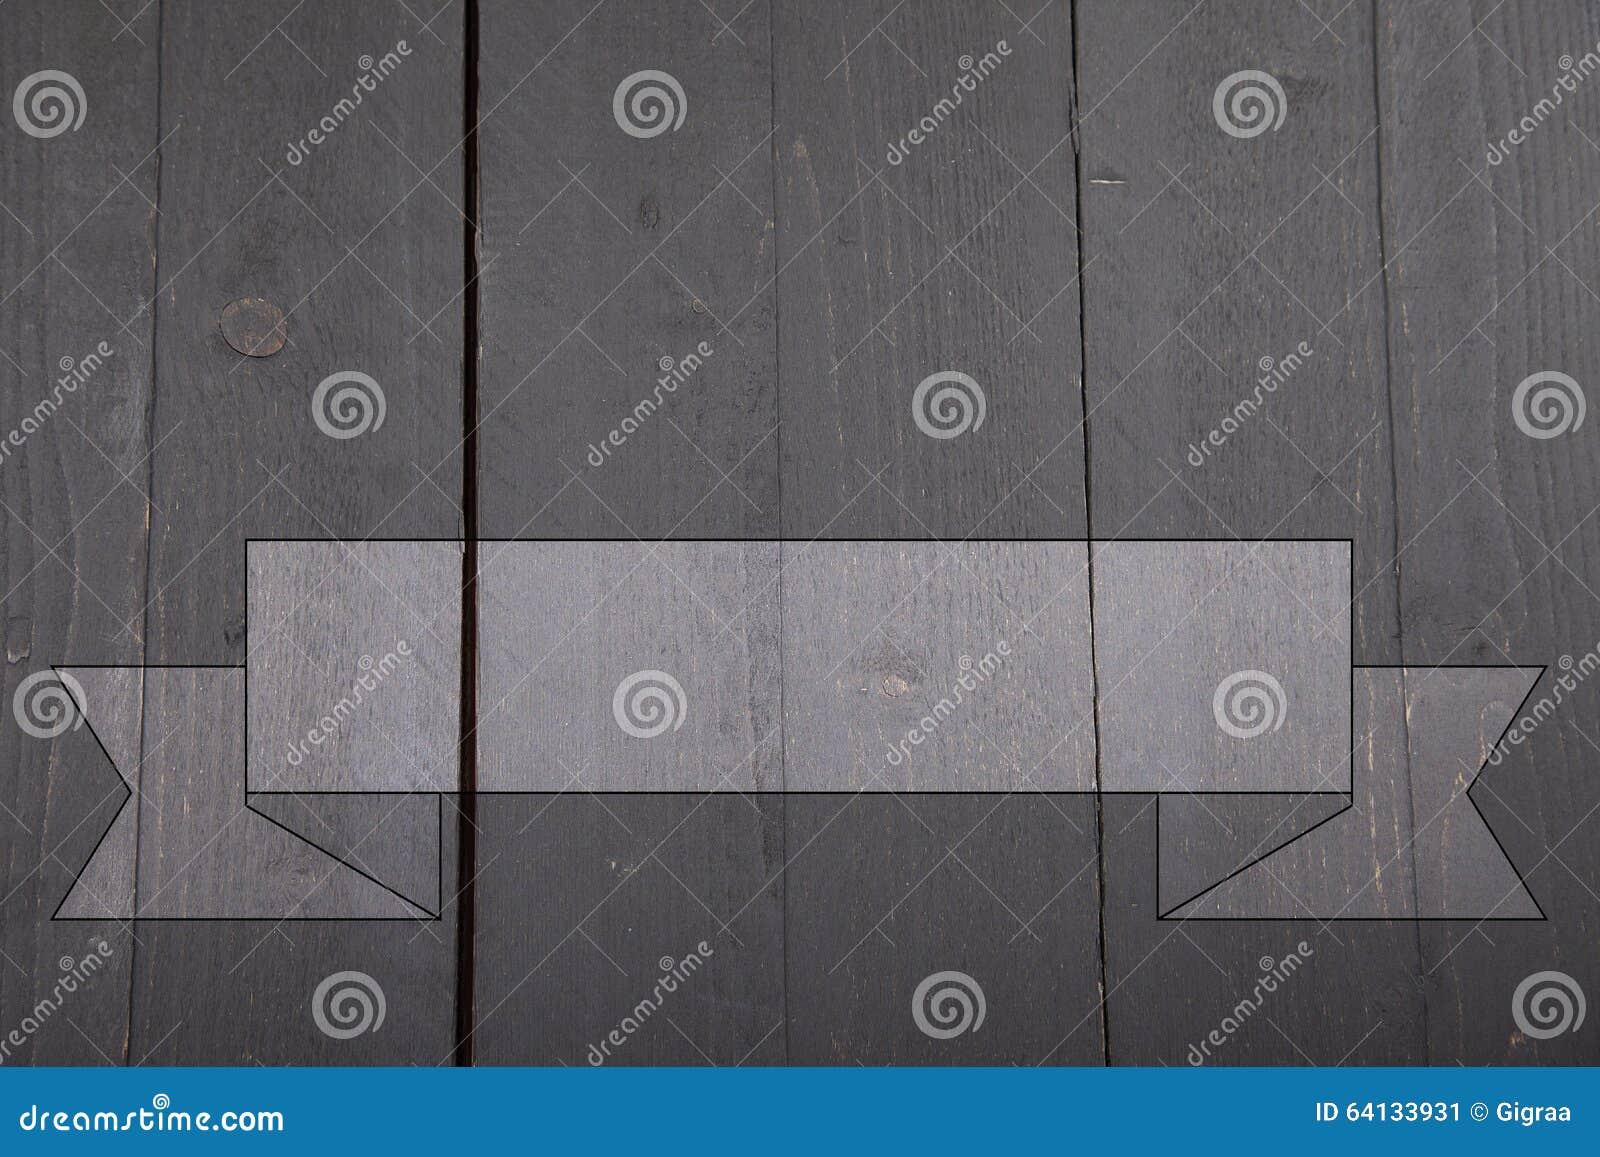 gris hq fondo negro - photo #27